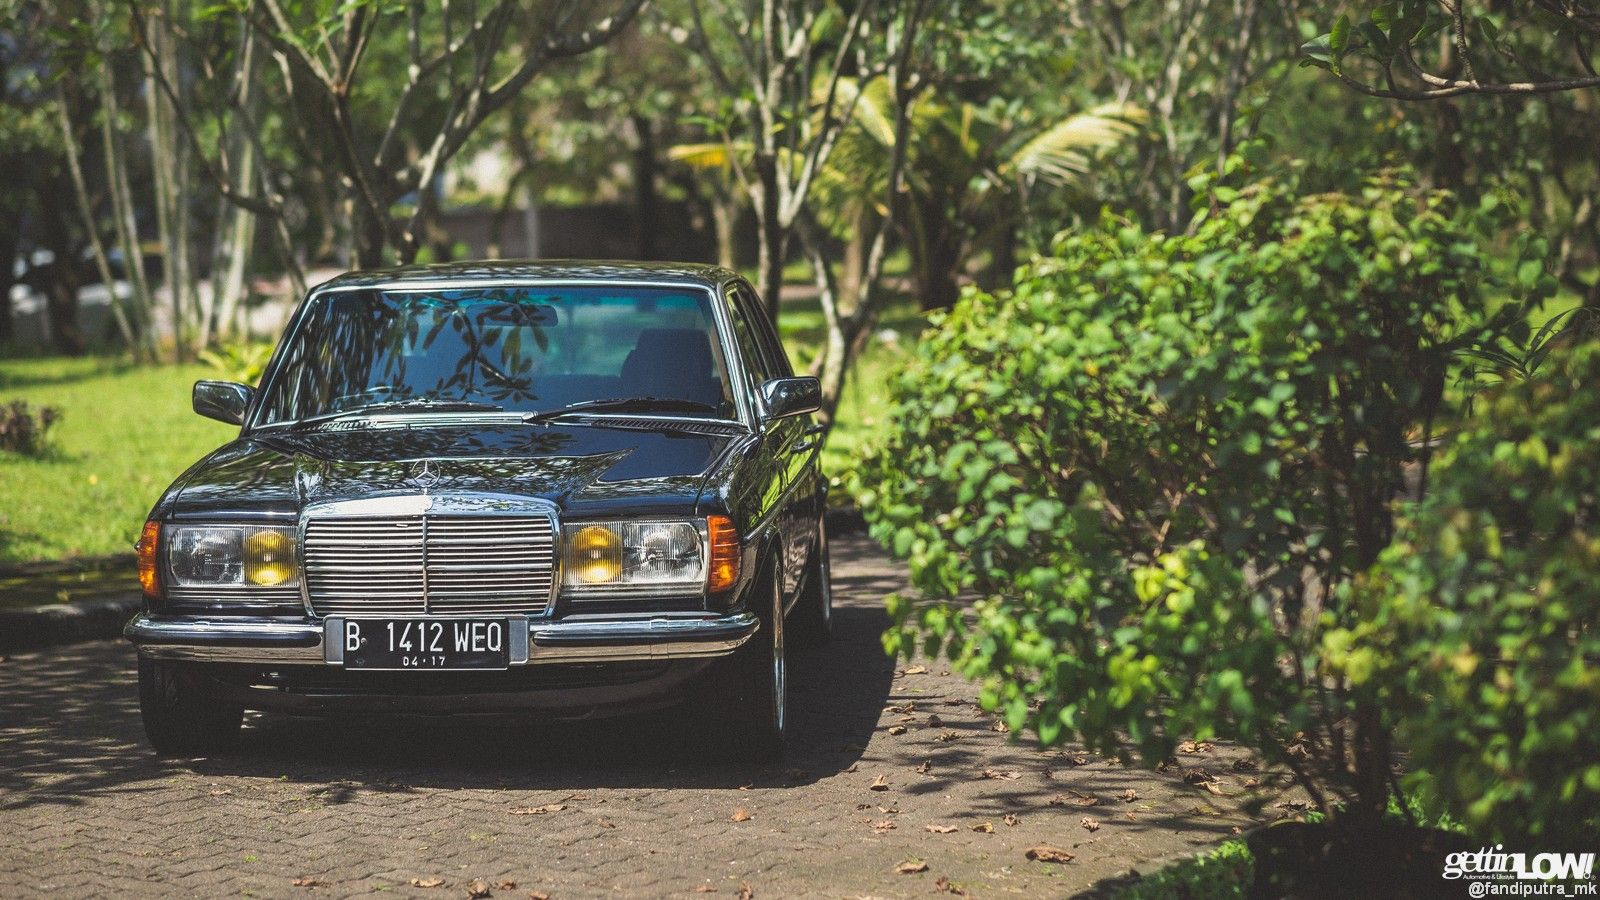 Daned Soedjito 1986 Mercedes Benz W123 280e On Amg Penta